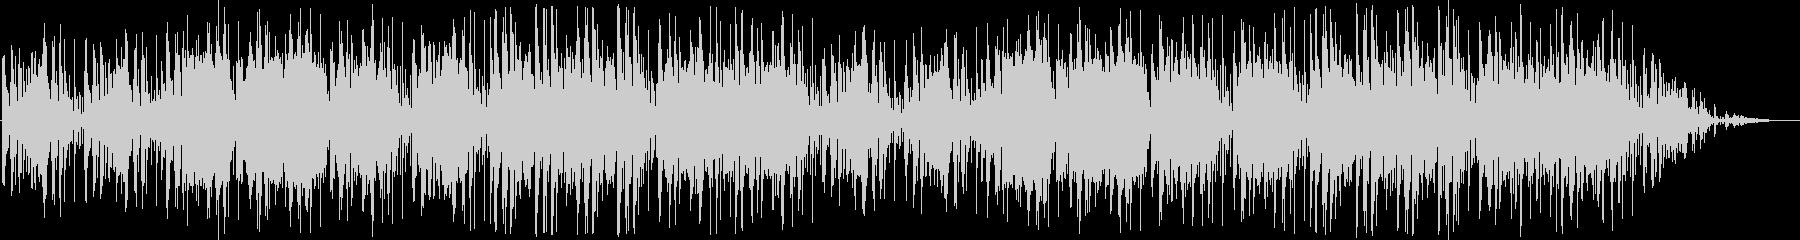 RPGフィールドBGM風オーケストラ曲3の未再生の波形